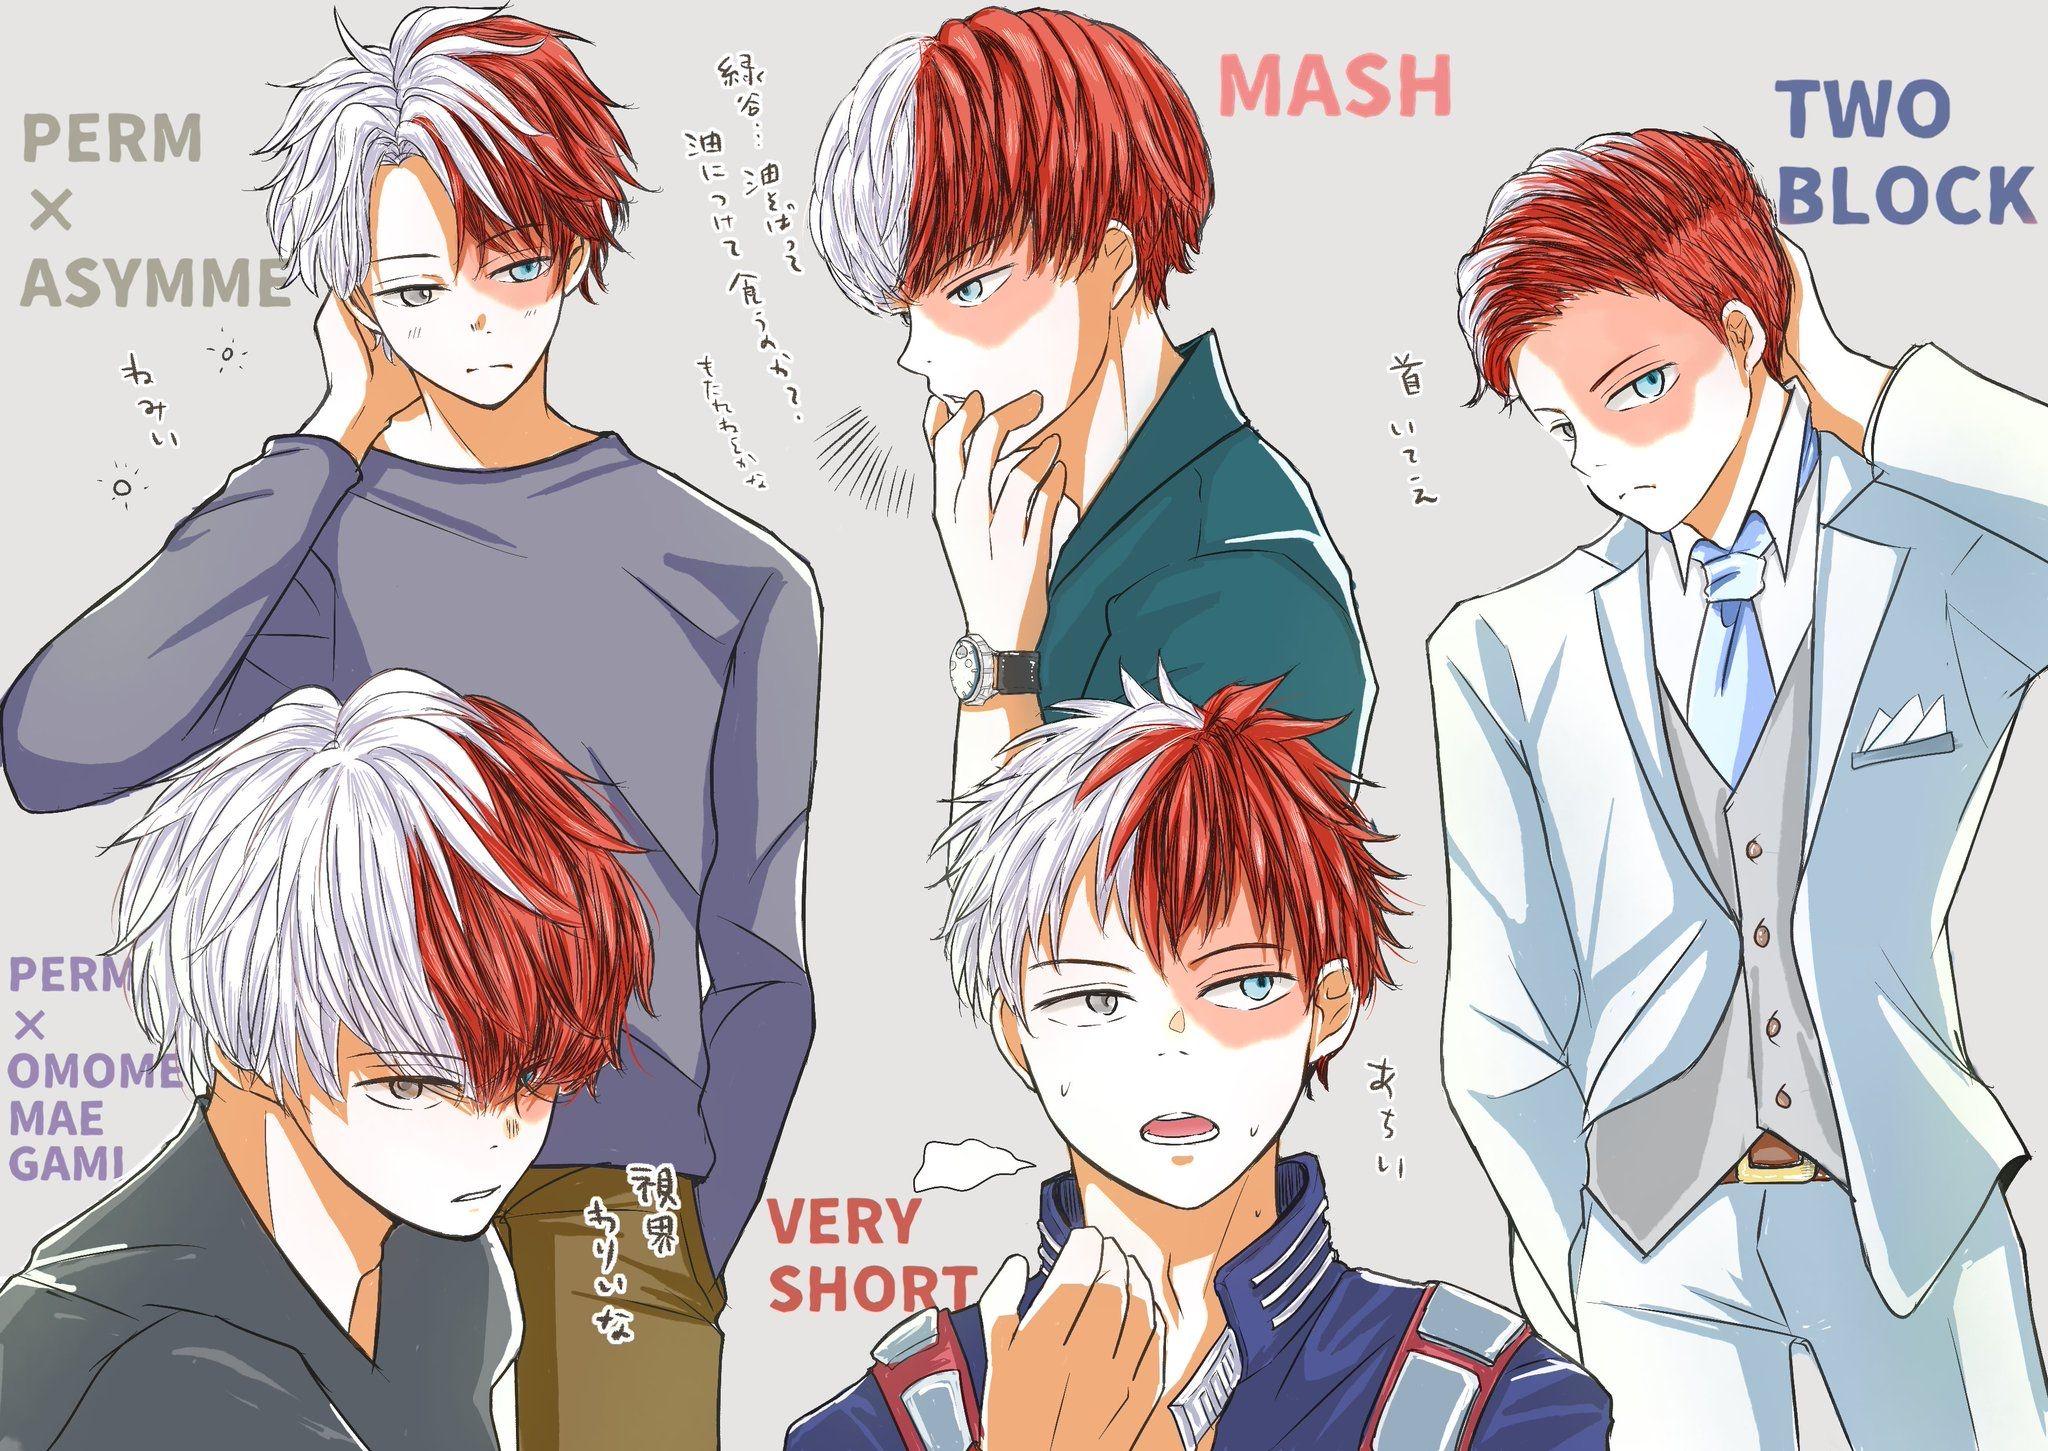 Anime: My Hero Academia #anime #manga #art #artwork #fanart #animeboy